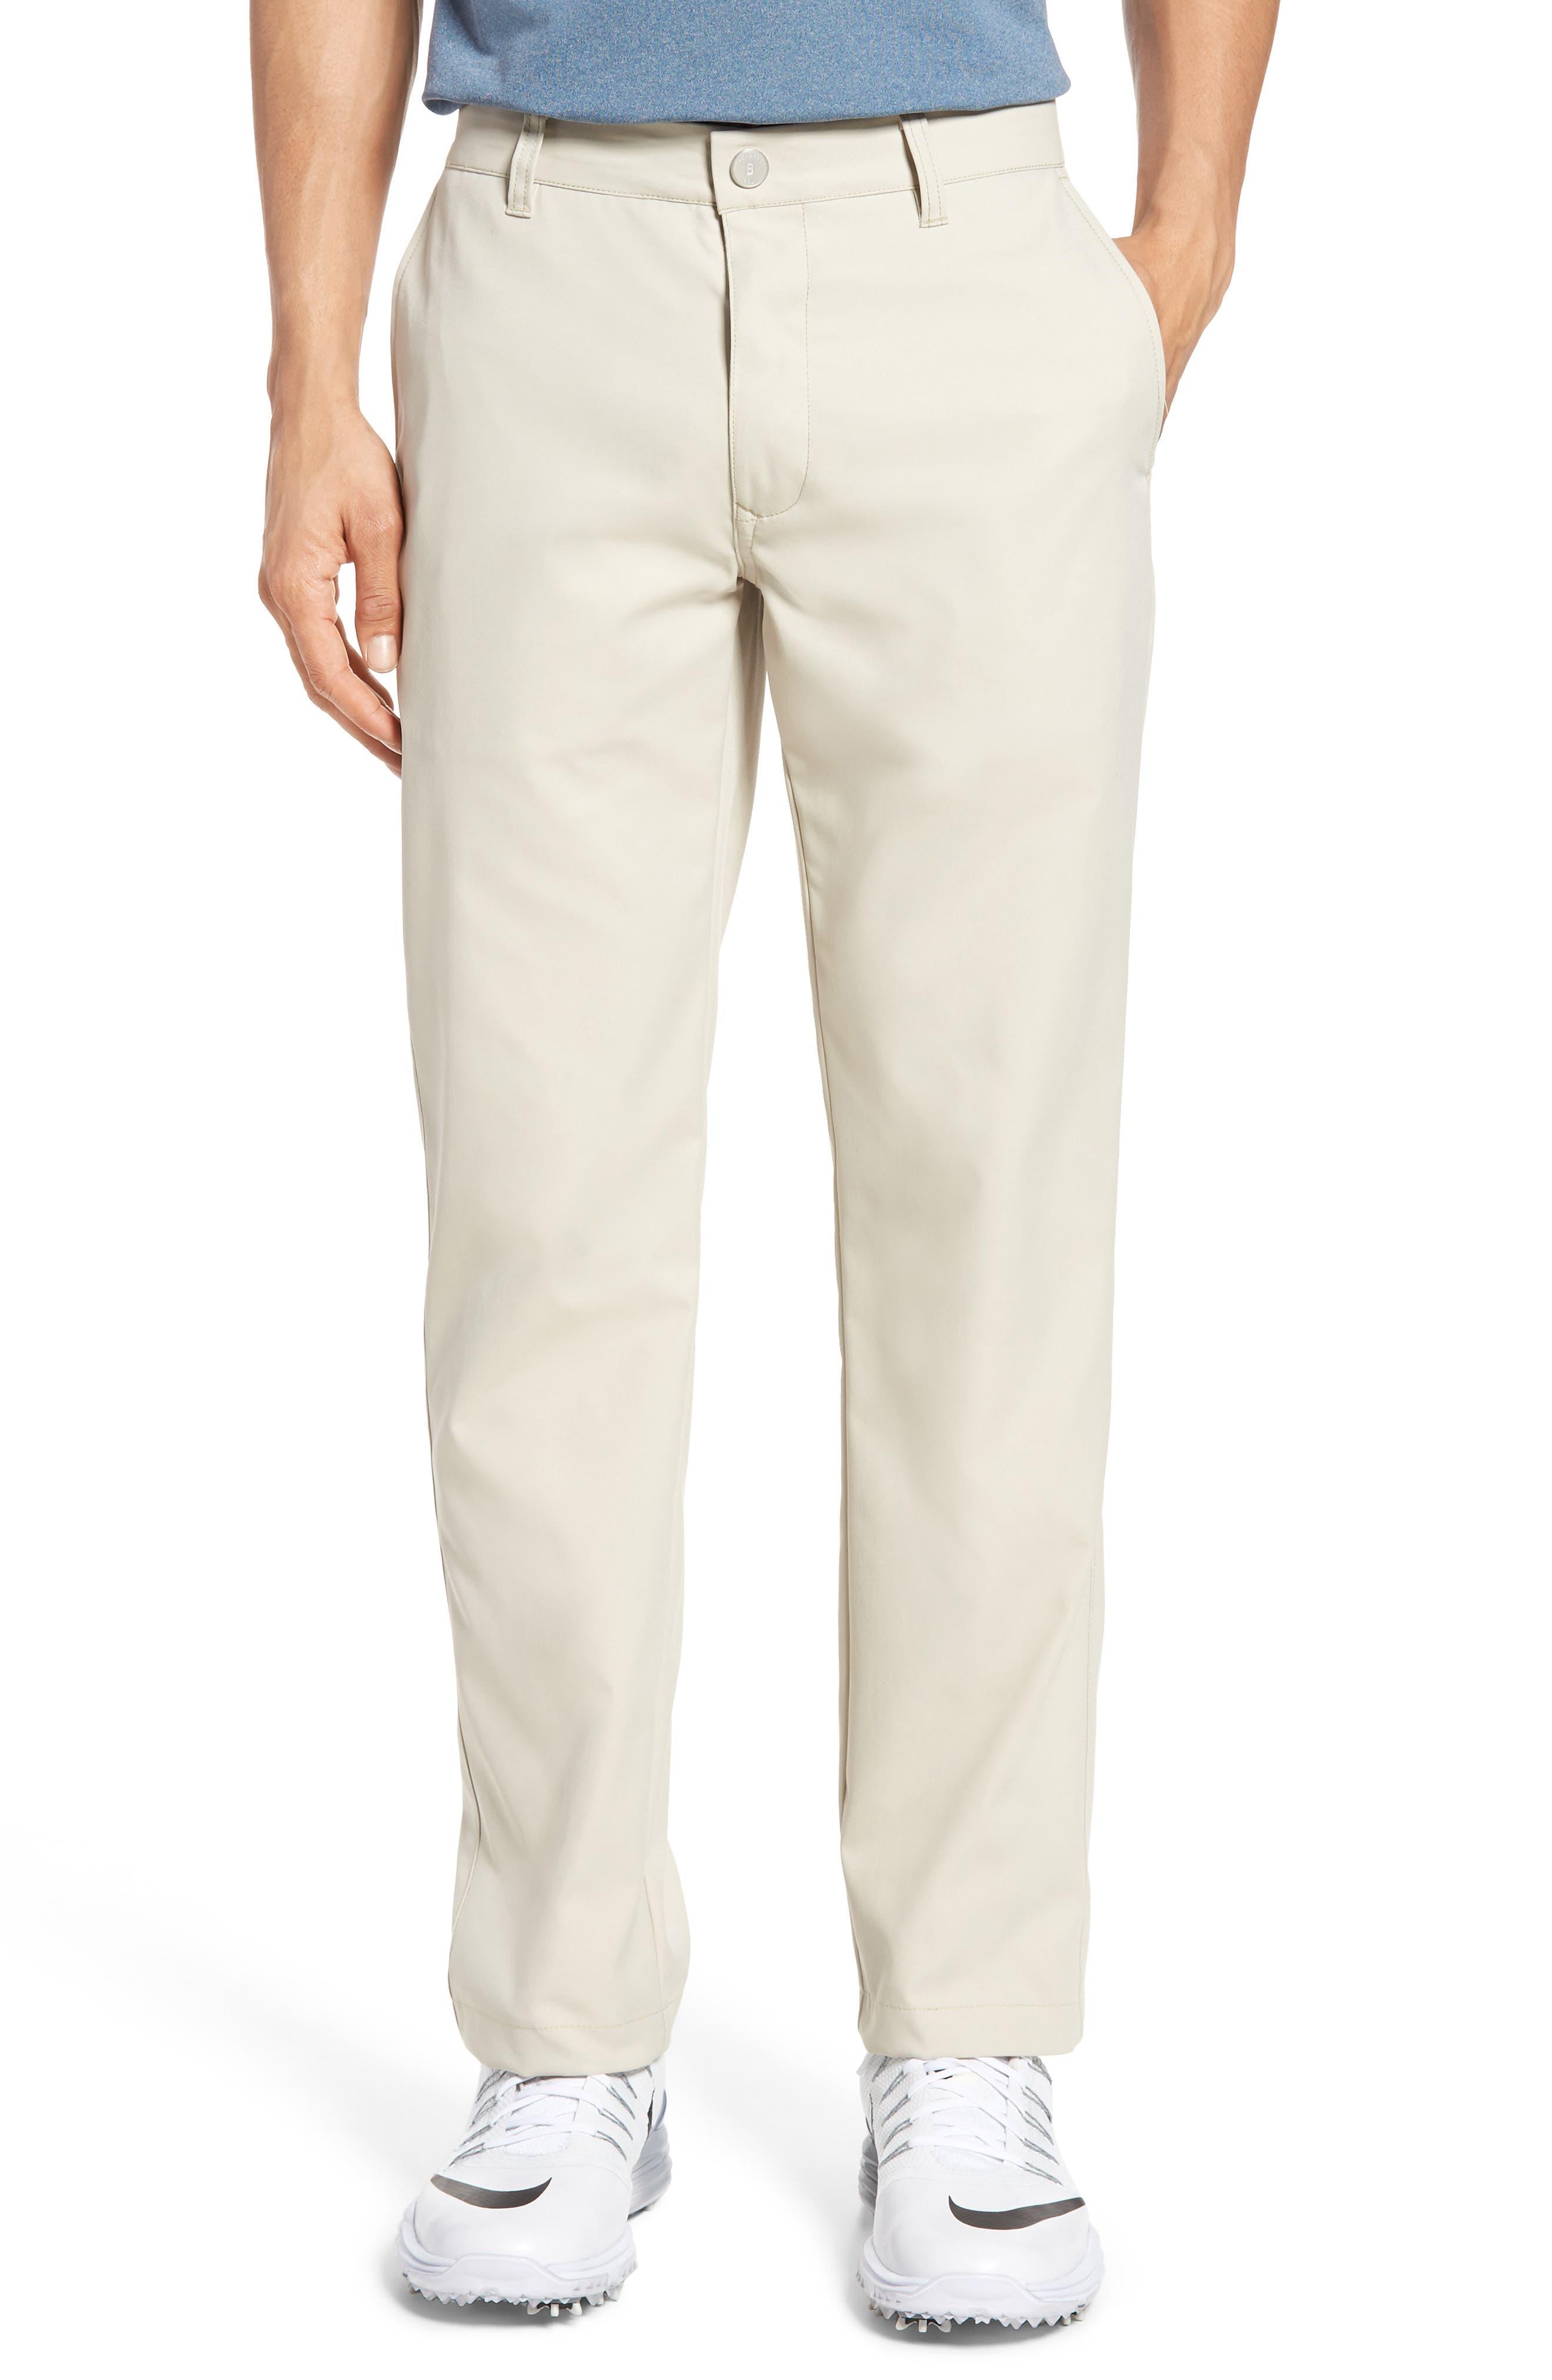 Highland Slim Fit Golf Pants,                         Main,                         color, STONE